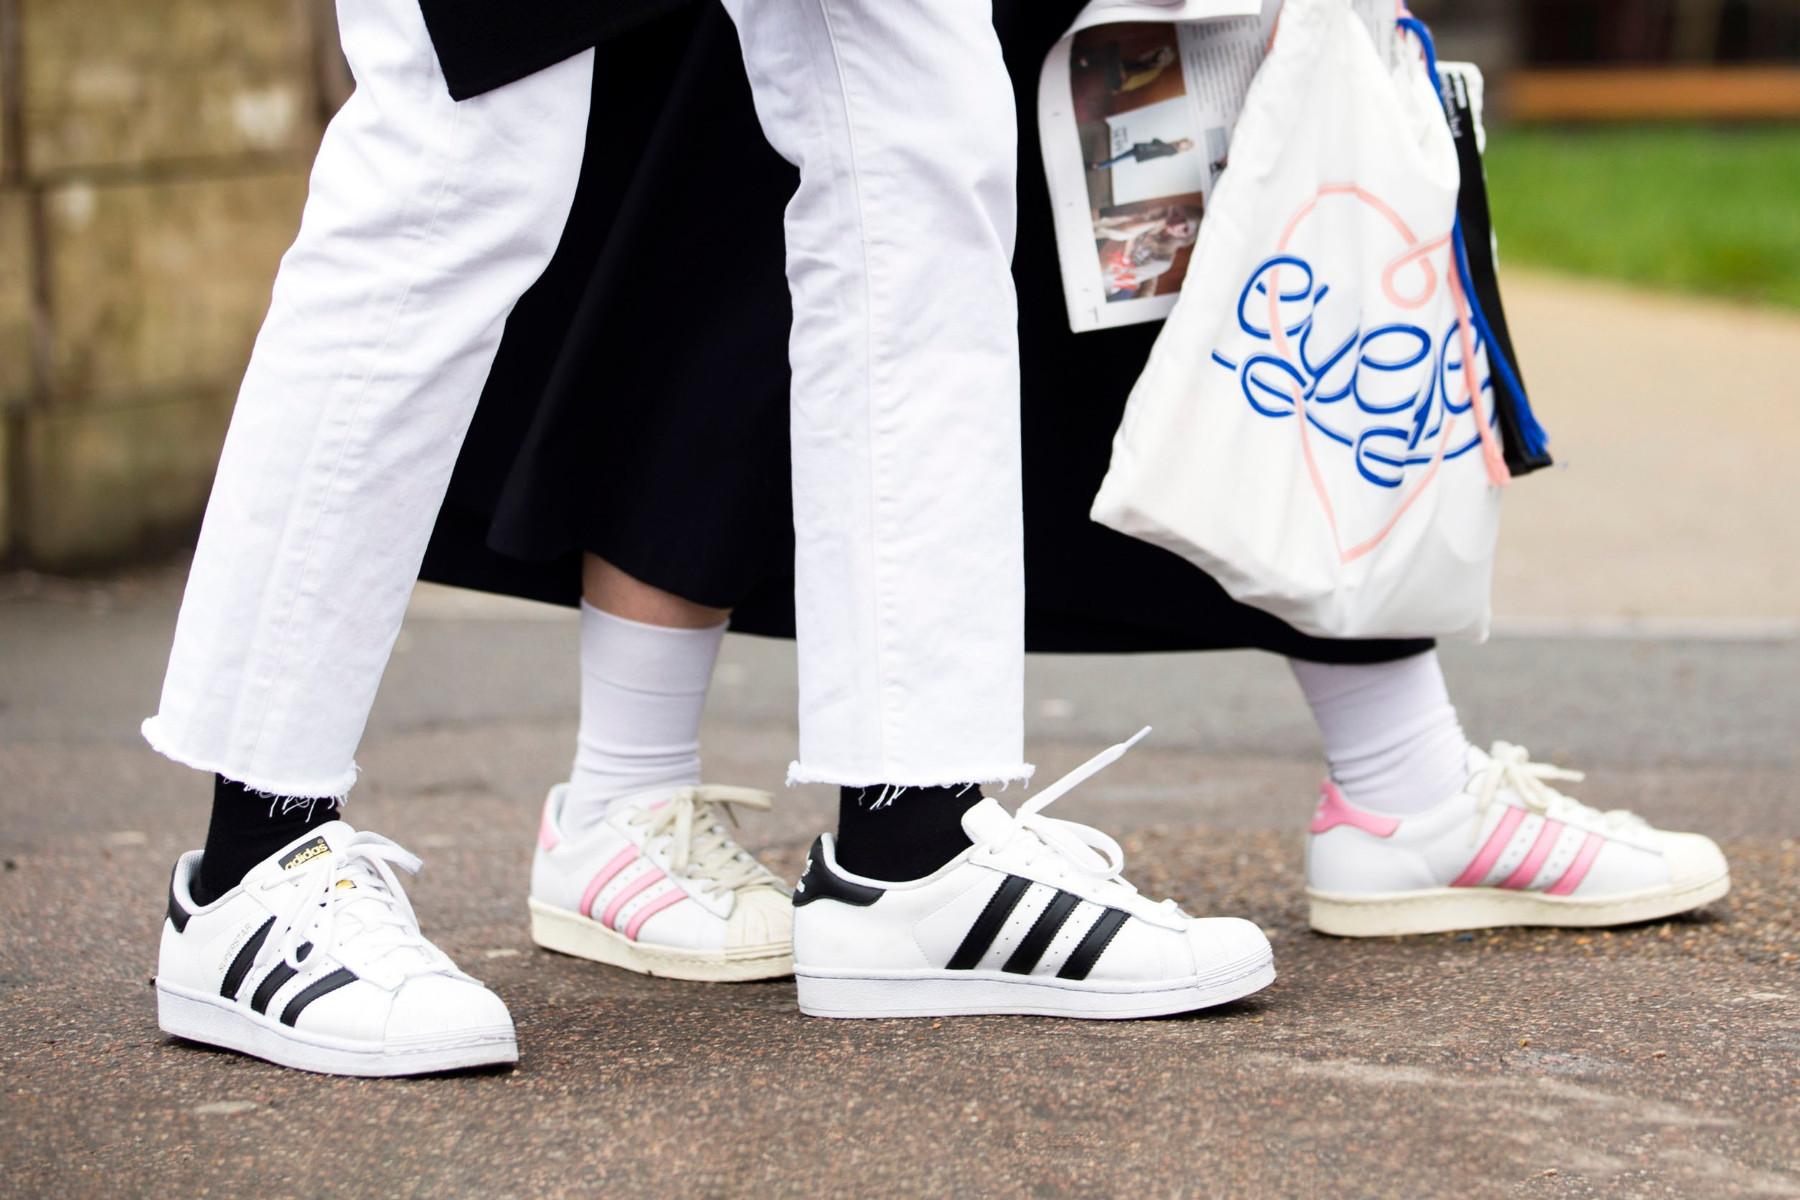 adidas Superstar on-feet